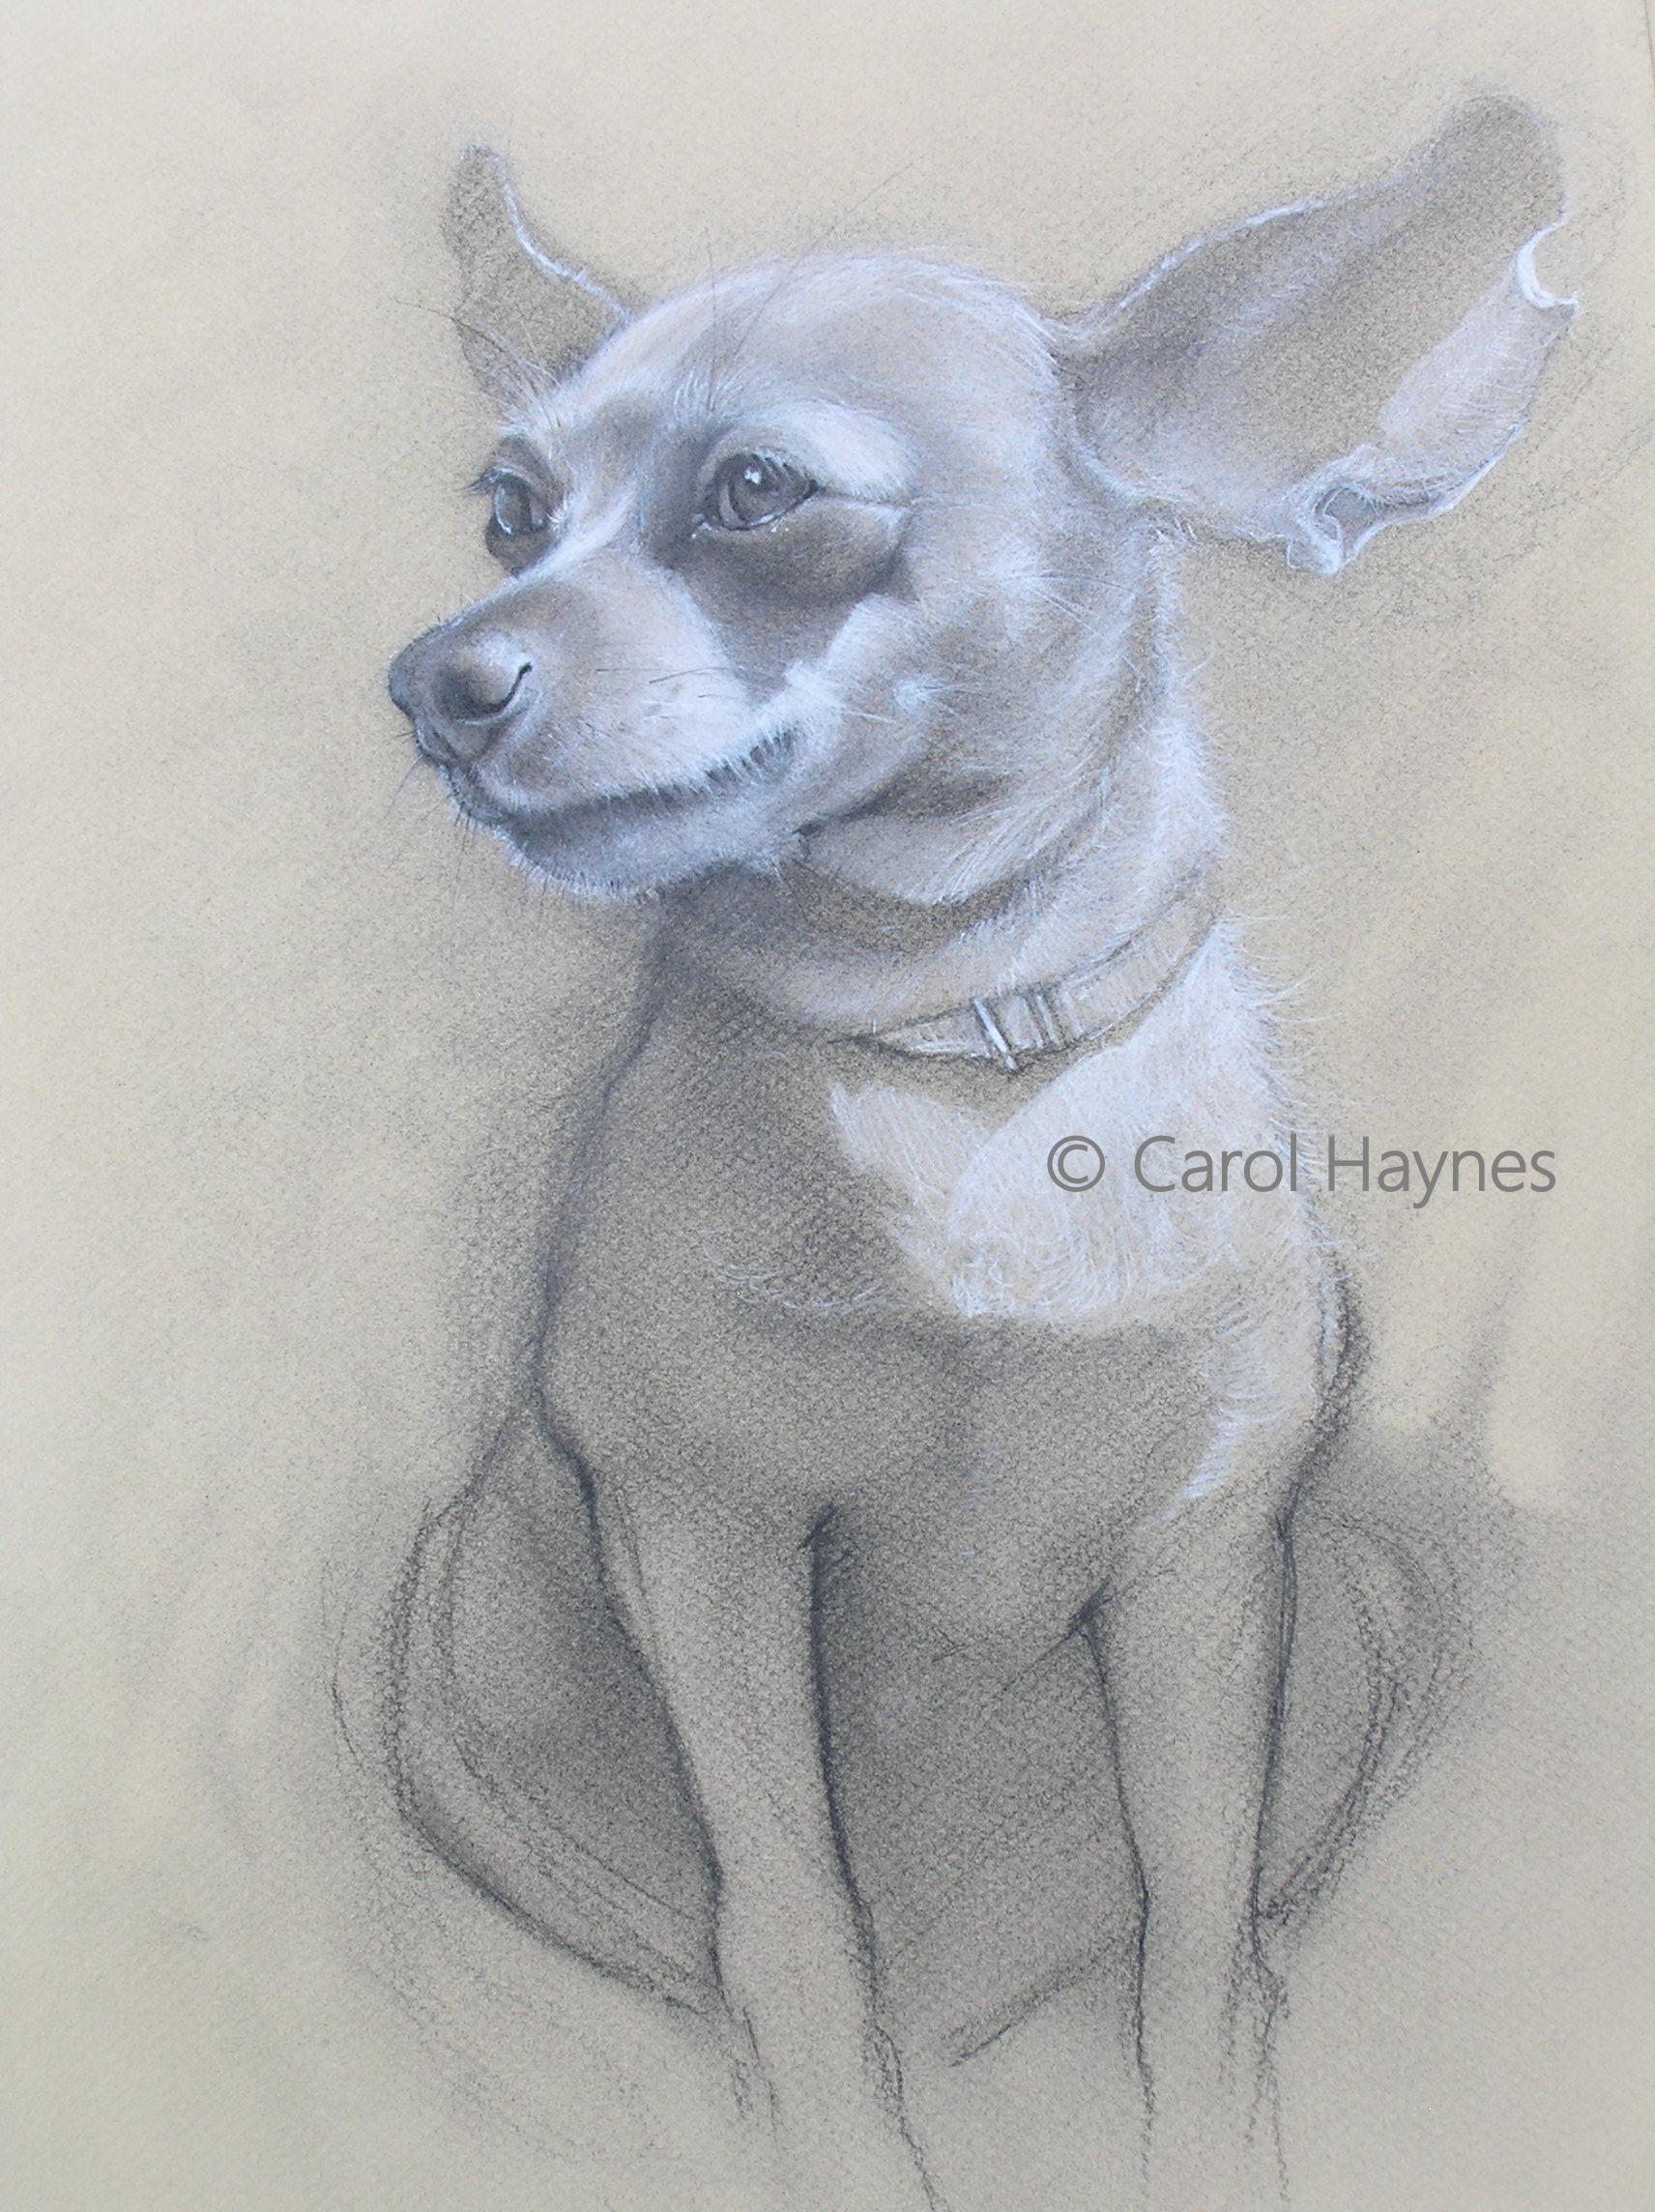 Carol Haynes, Who bit Riley's Ear?